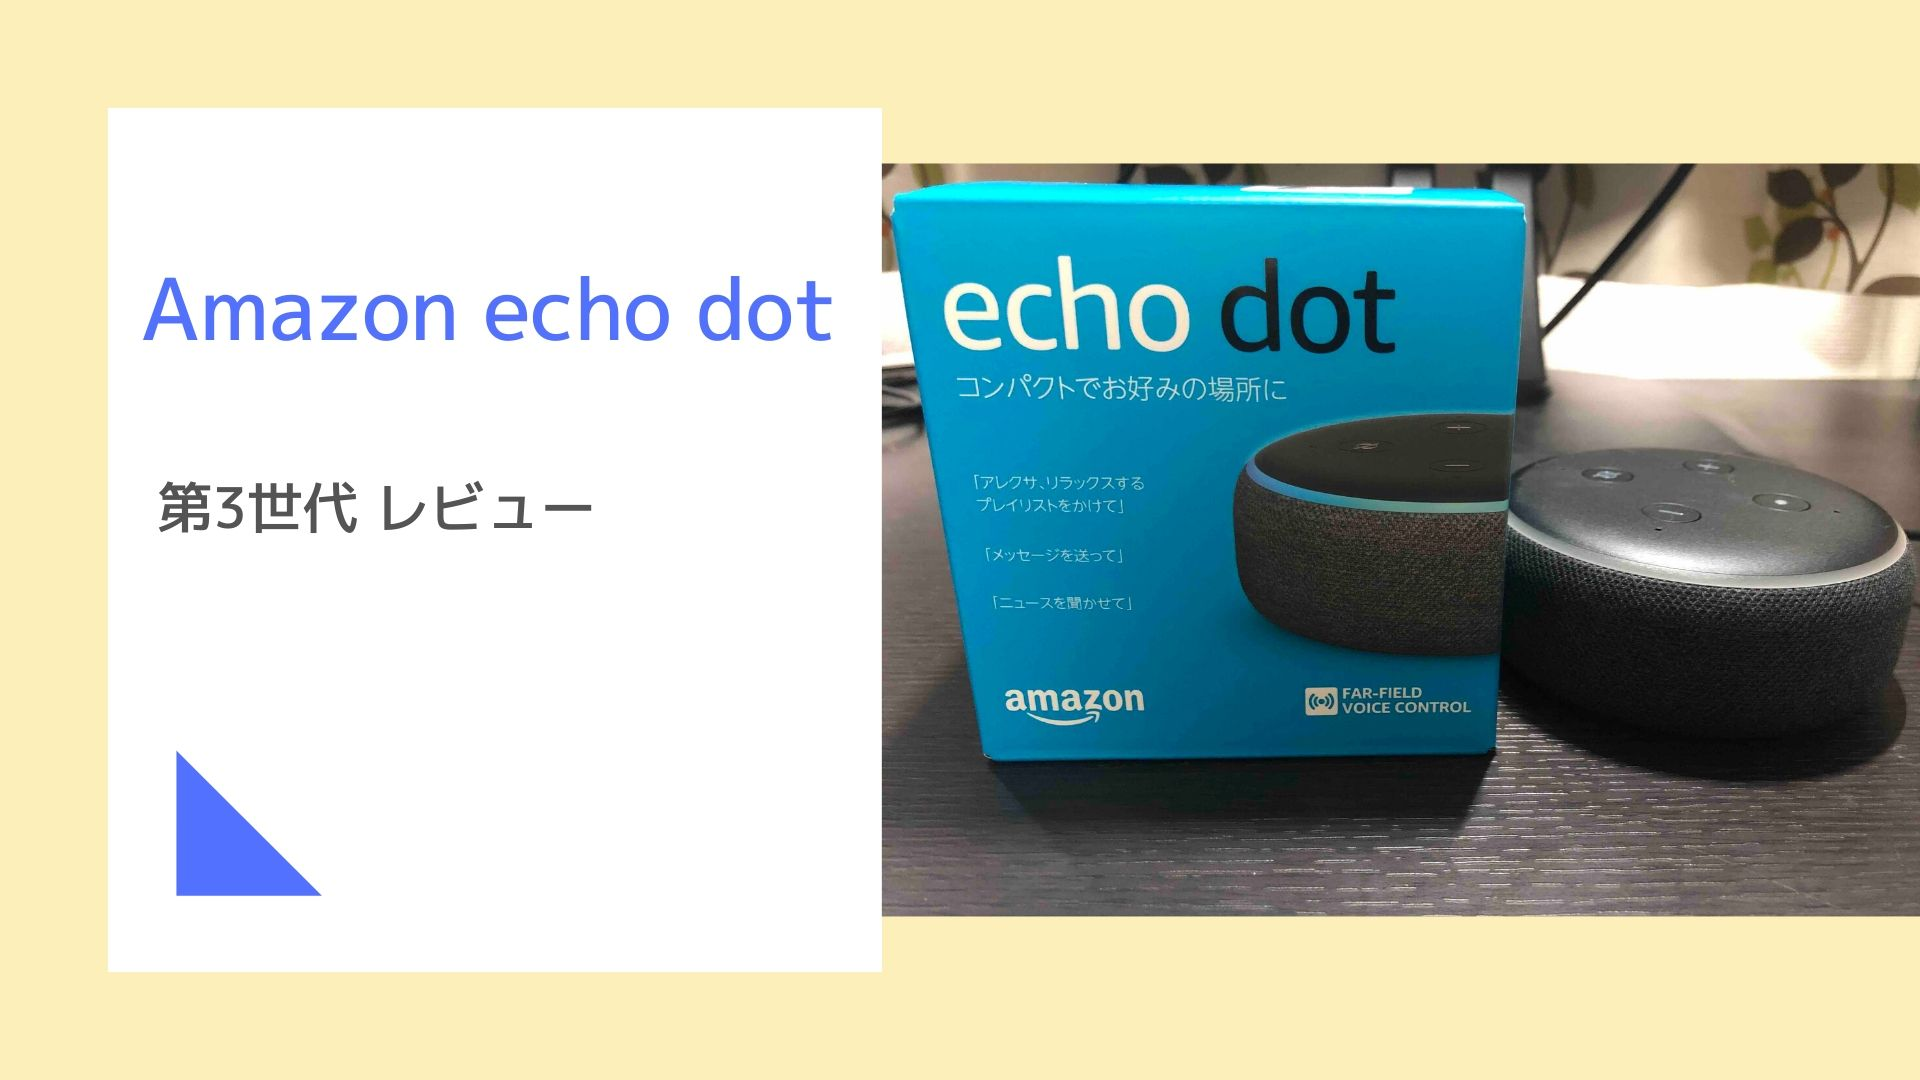 Amazon echo dot 第3世代レビュー